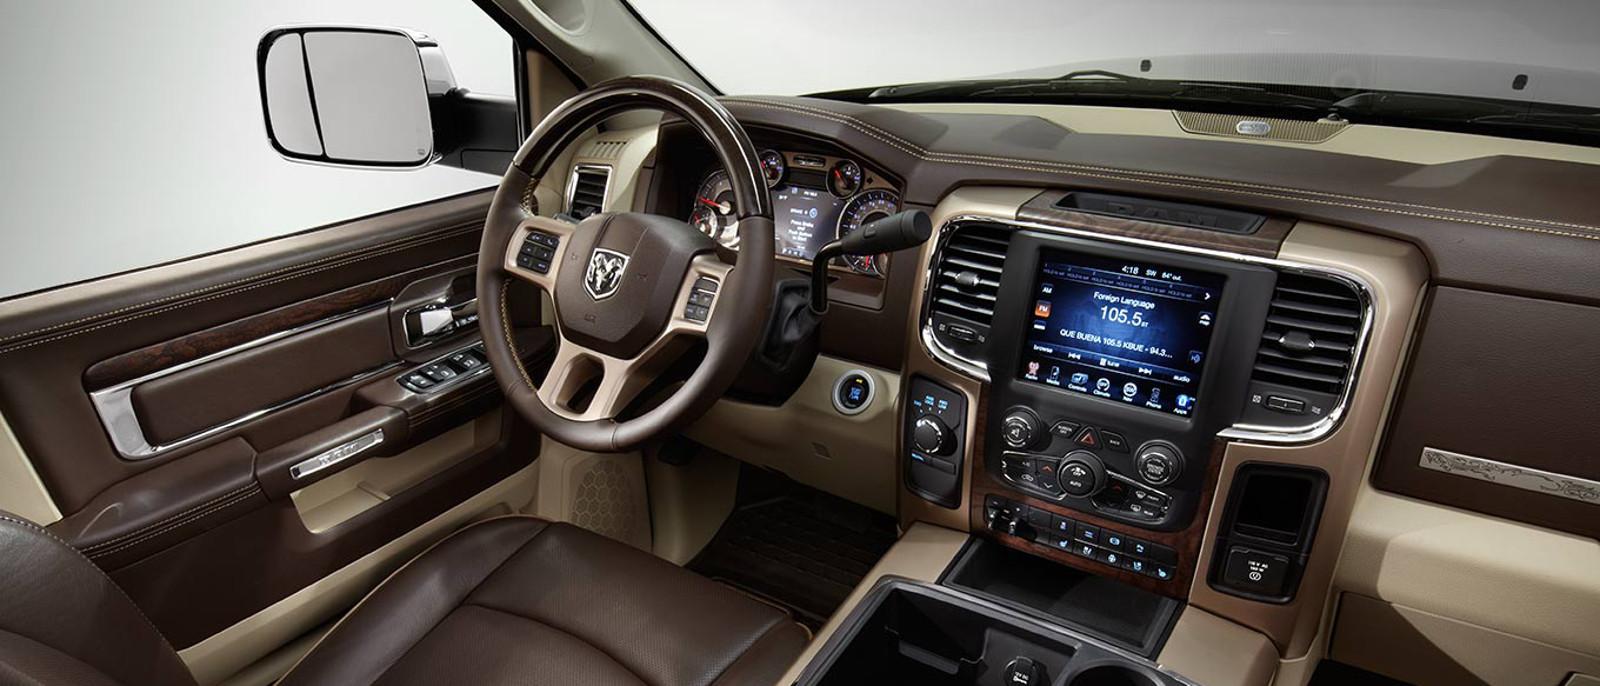 2014 Ram 3500 Interior Cockpit